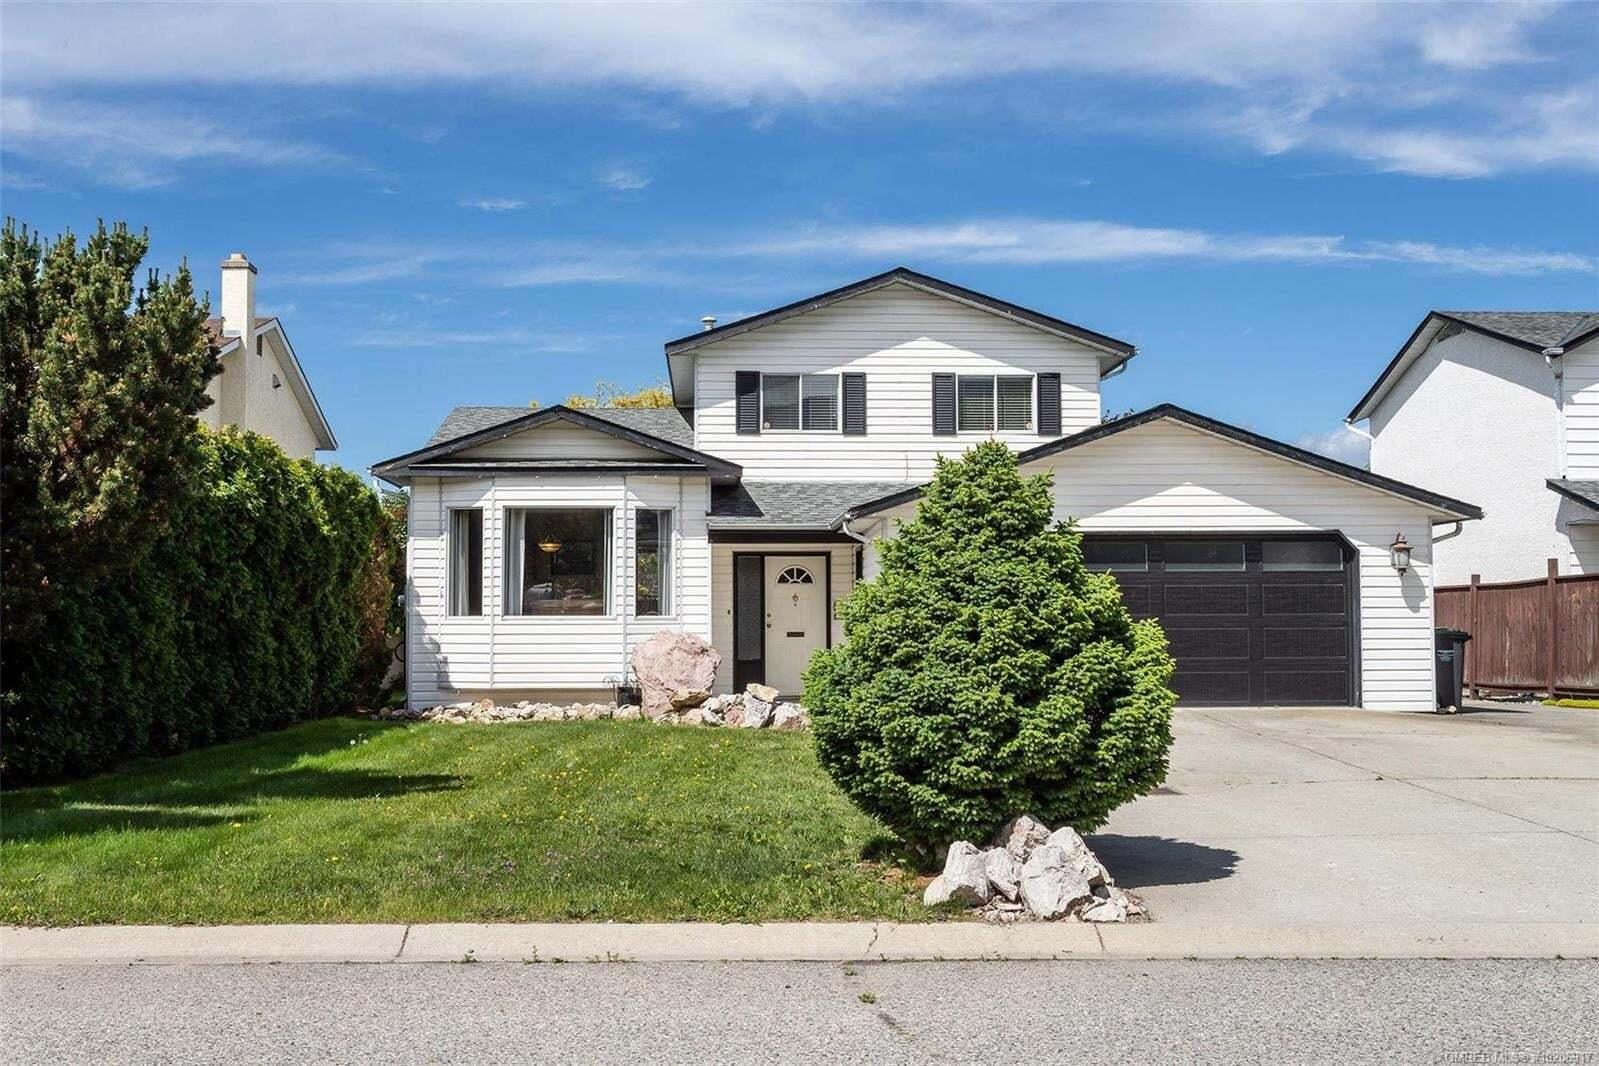 House for sale at 158 Bornais St Kelowna British Columbia - MLS: 10206917